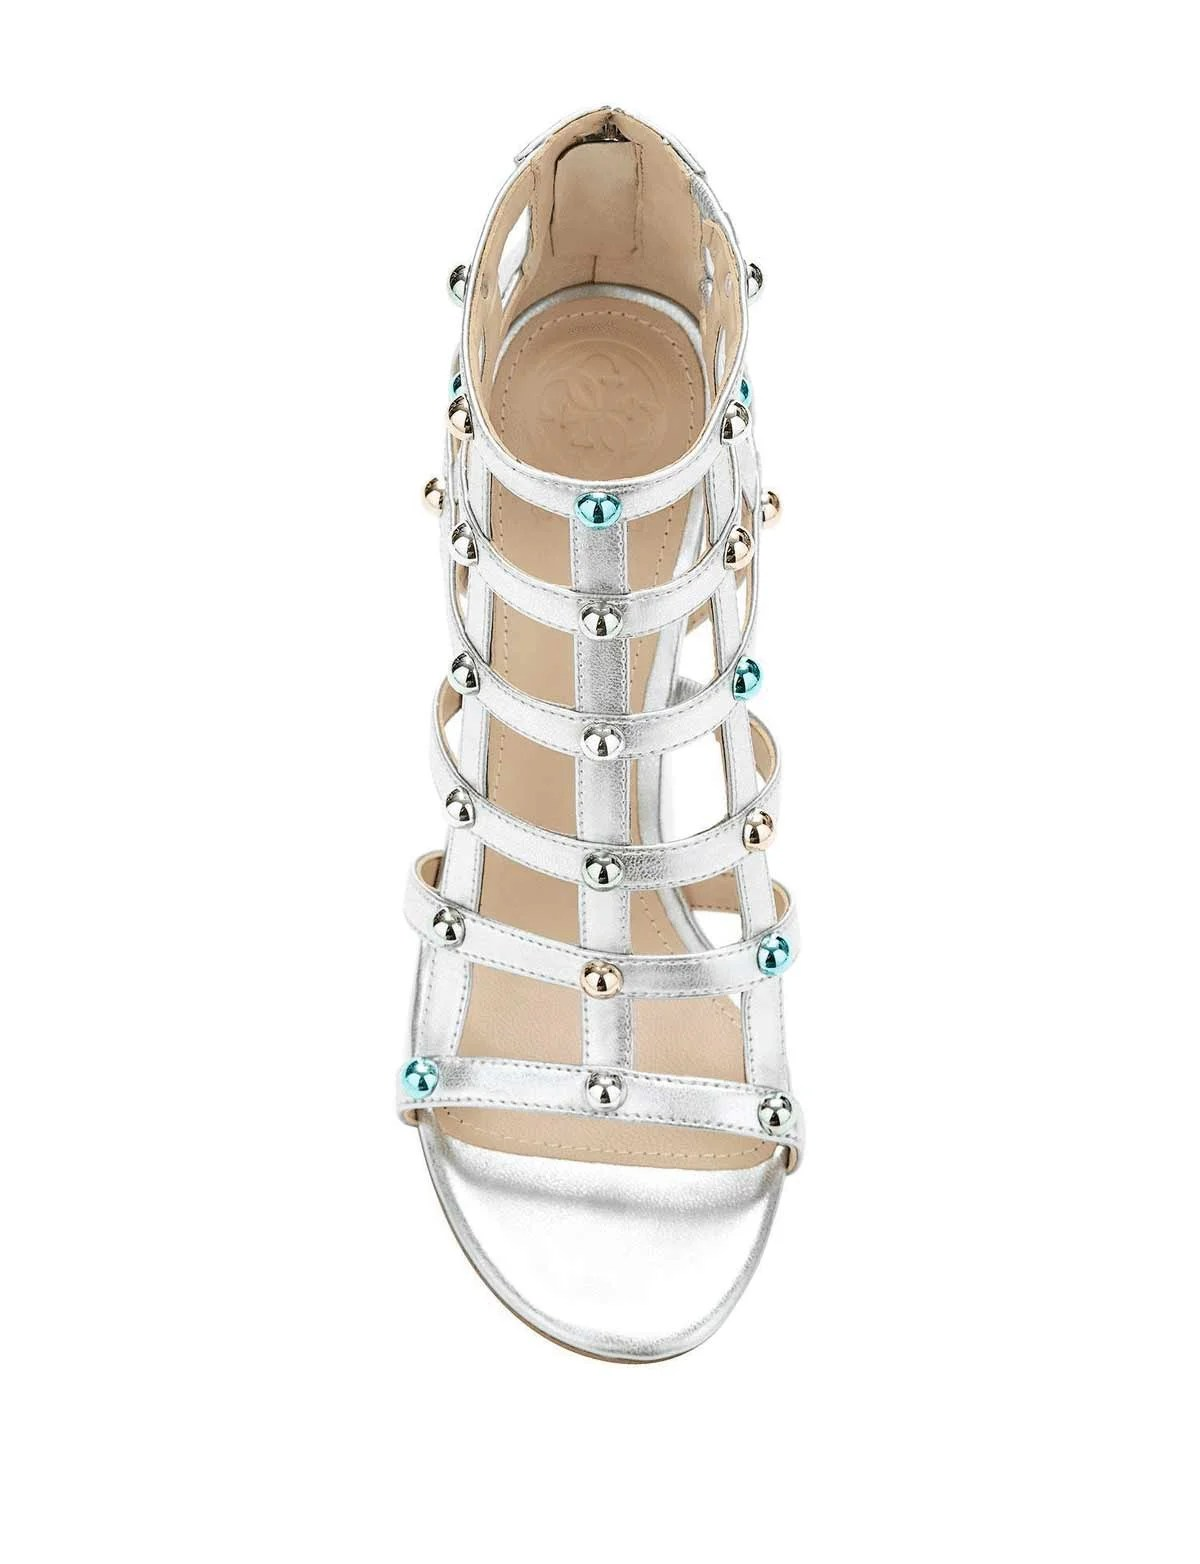 402.378 GUESS Damen Marken-Sandalette m. Nieten Silberfarben